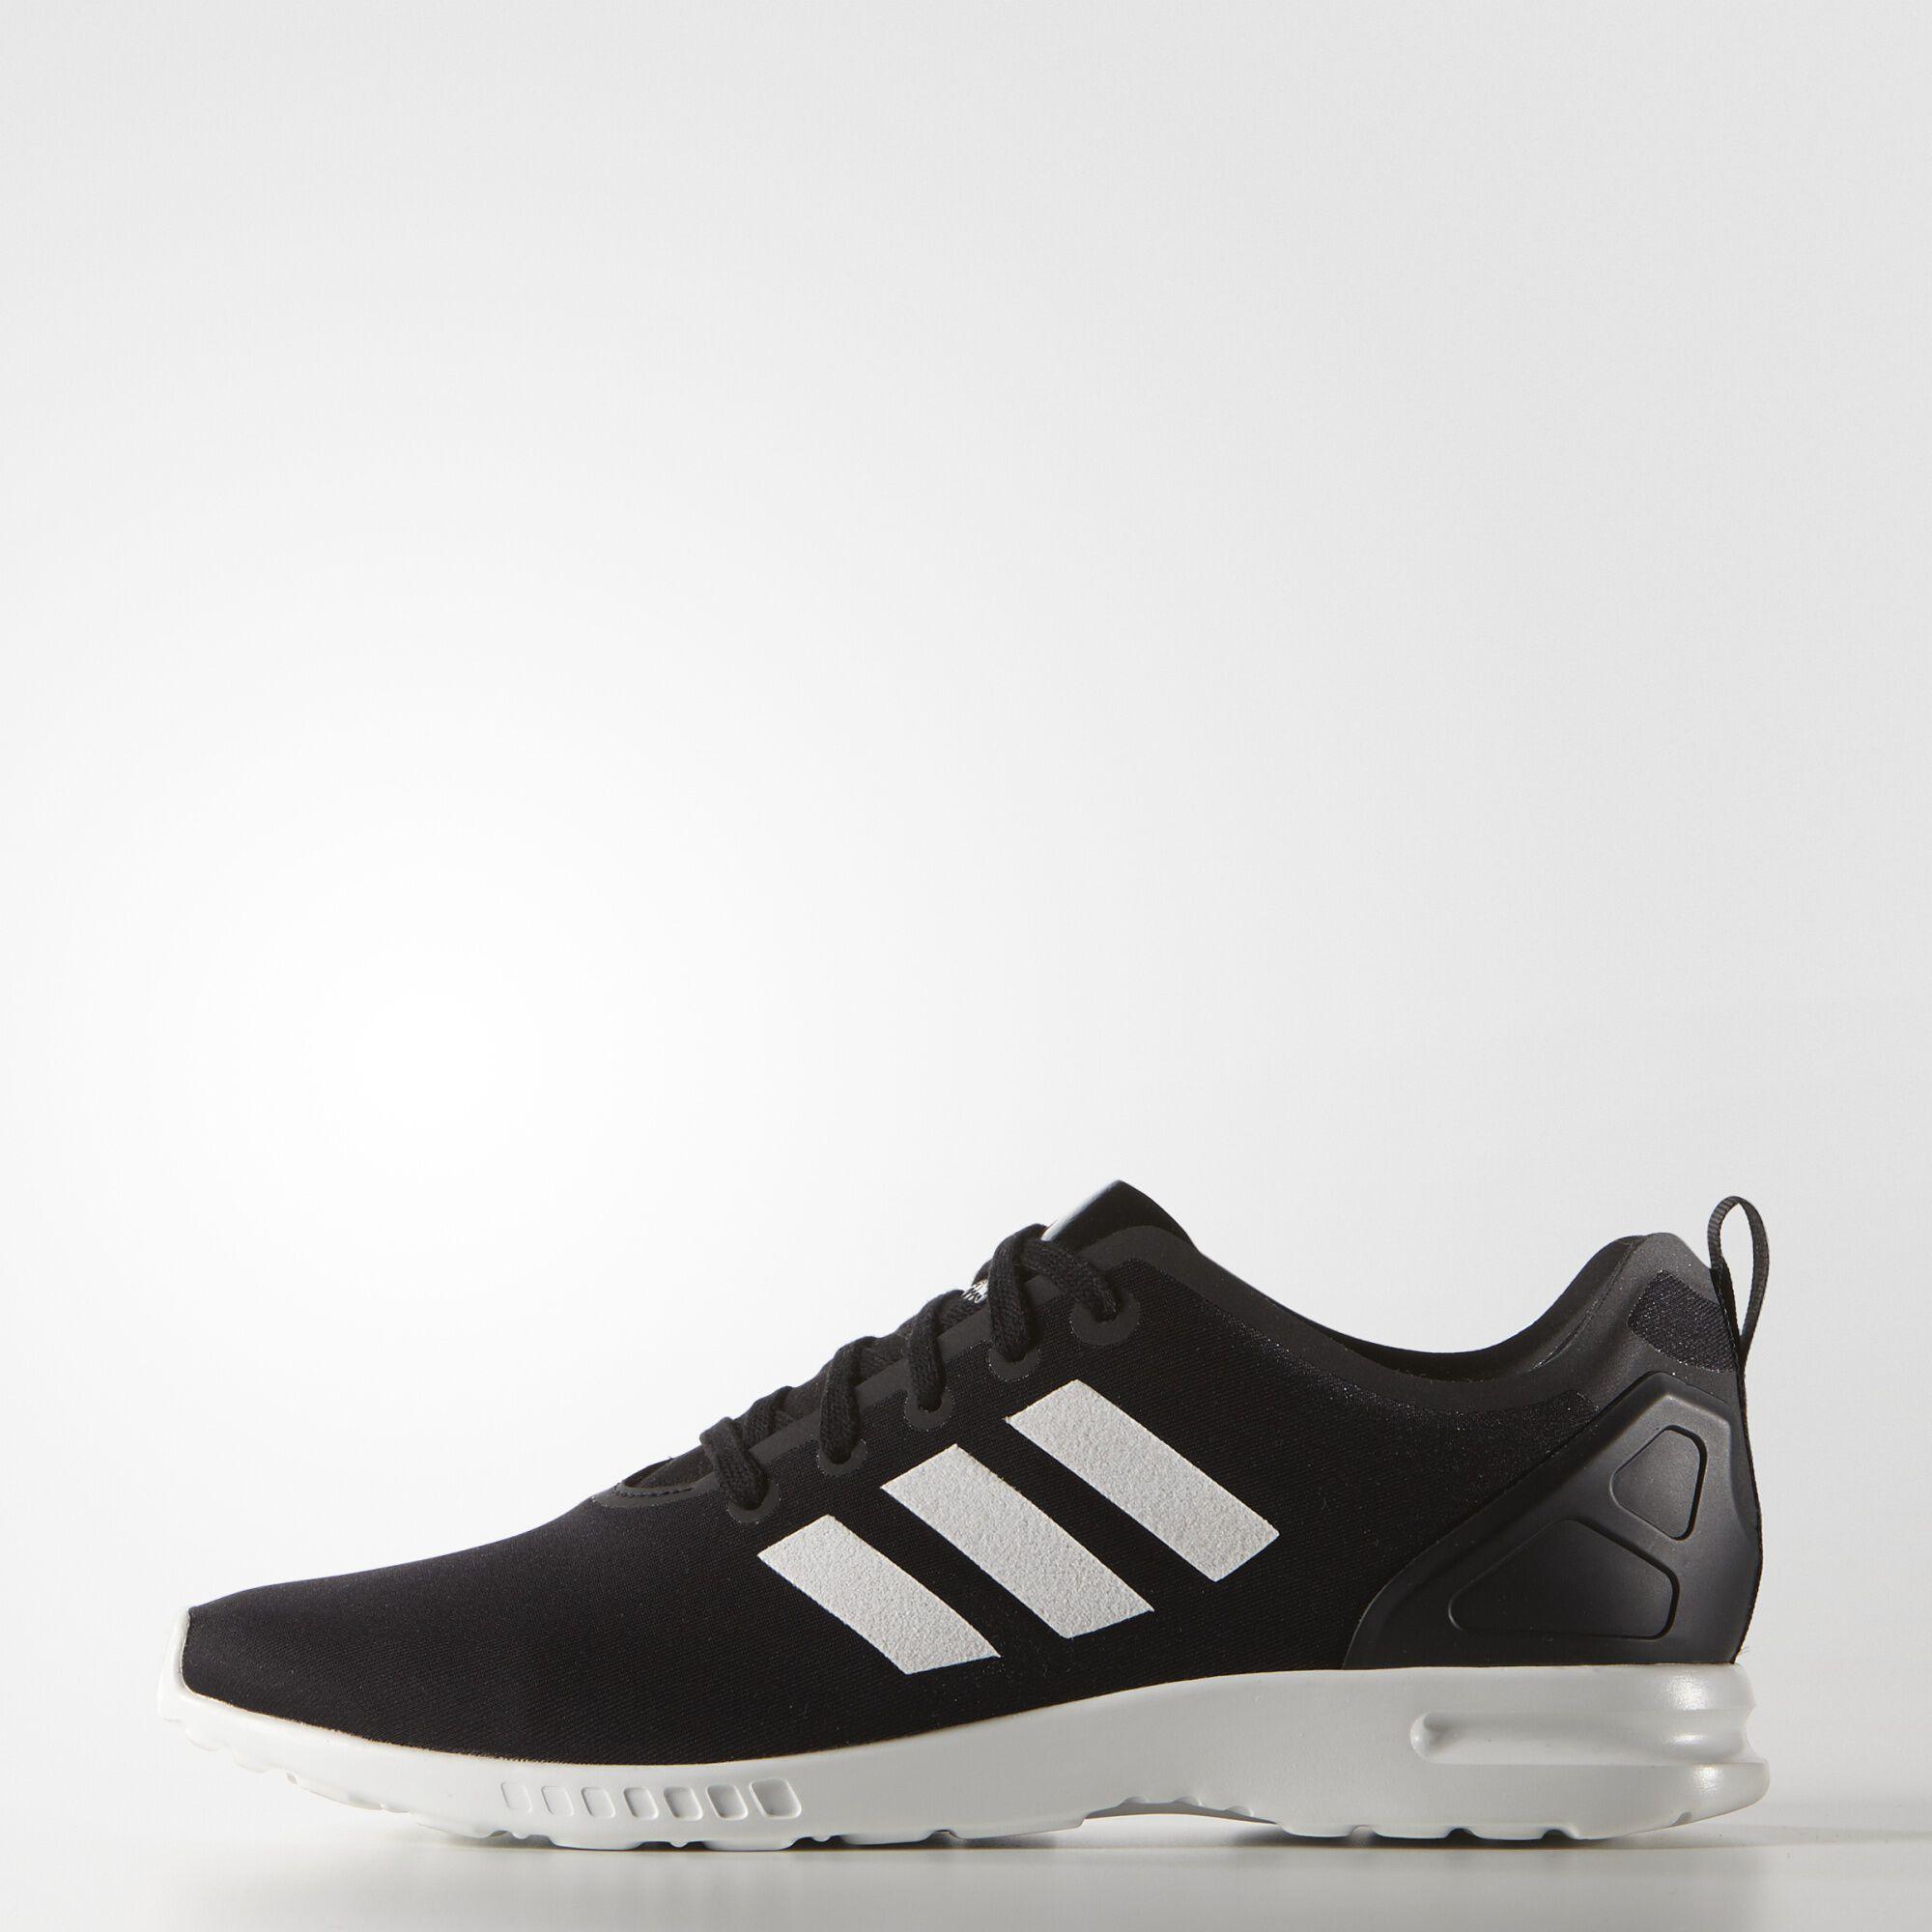 Adidas Zx Flux Smooth